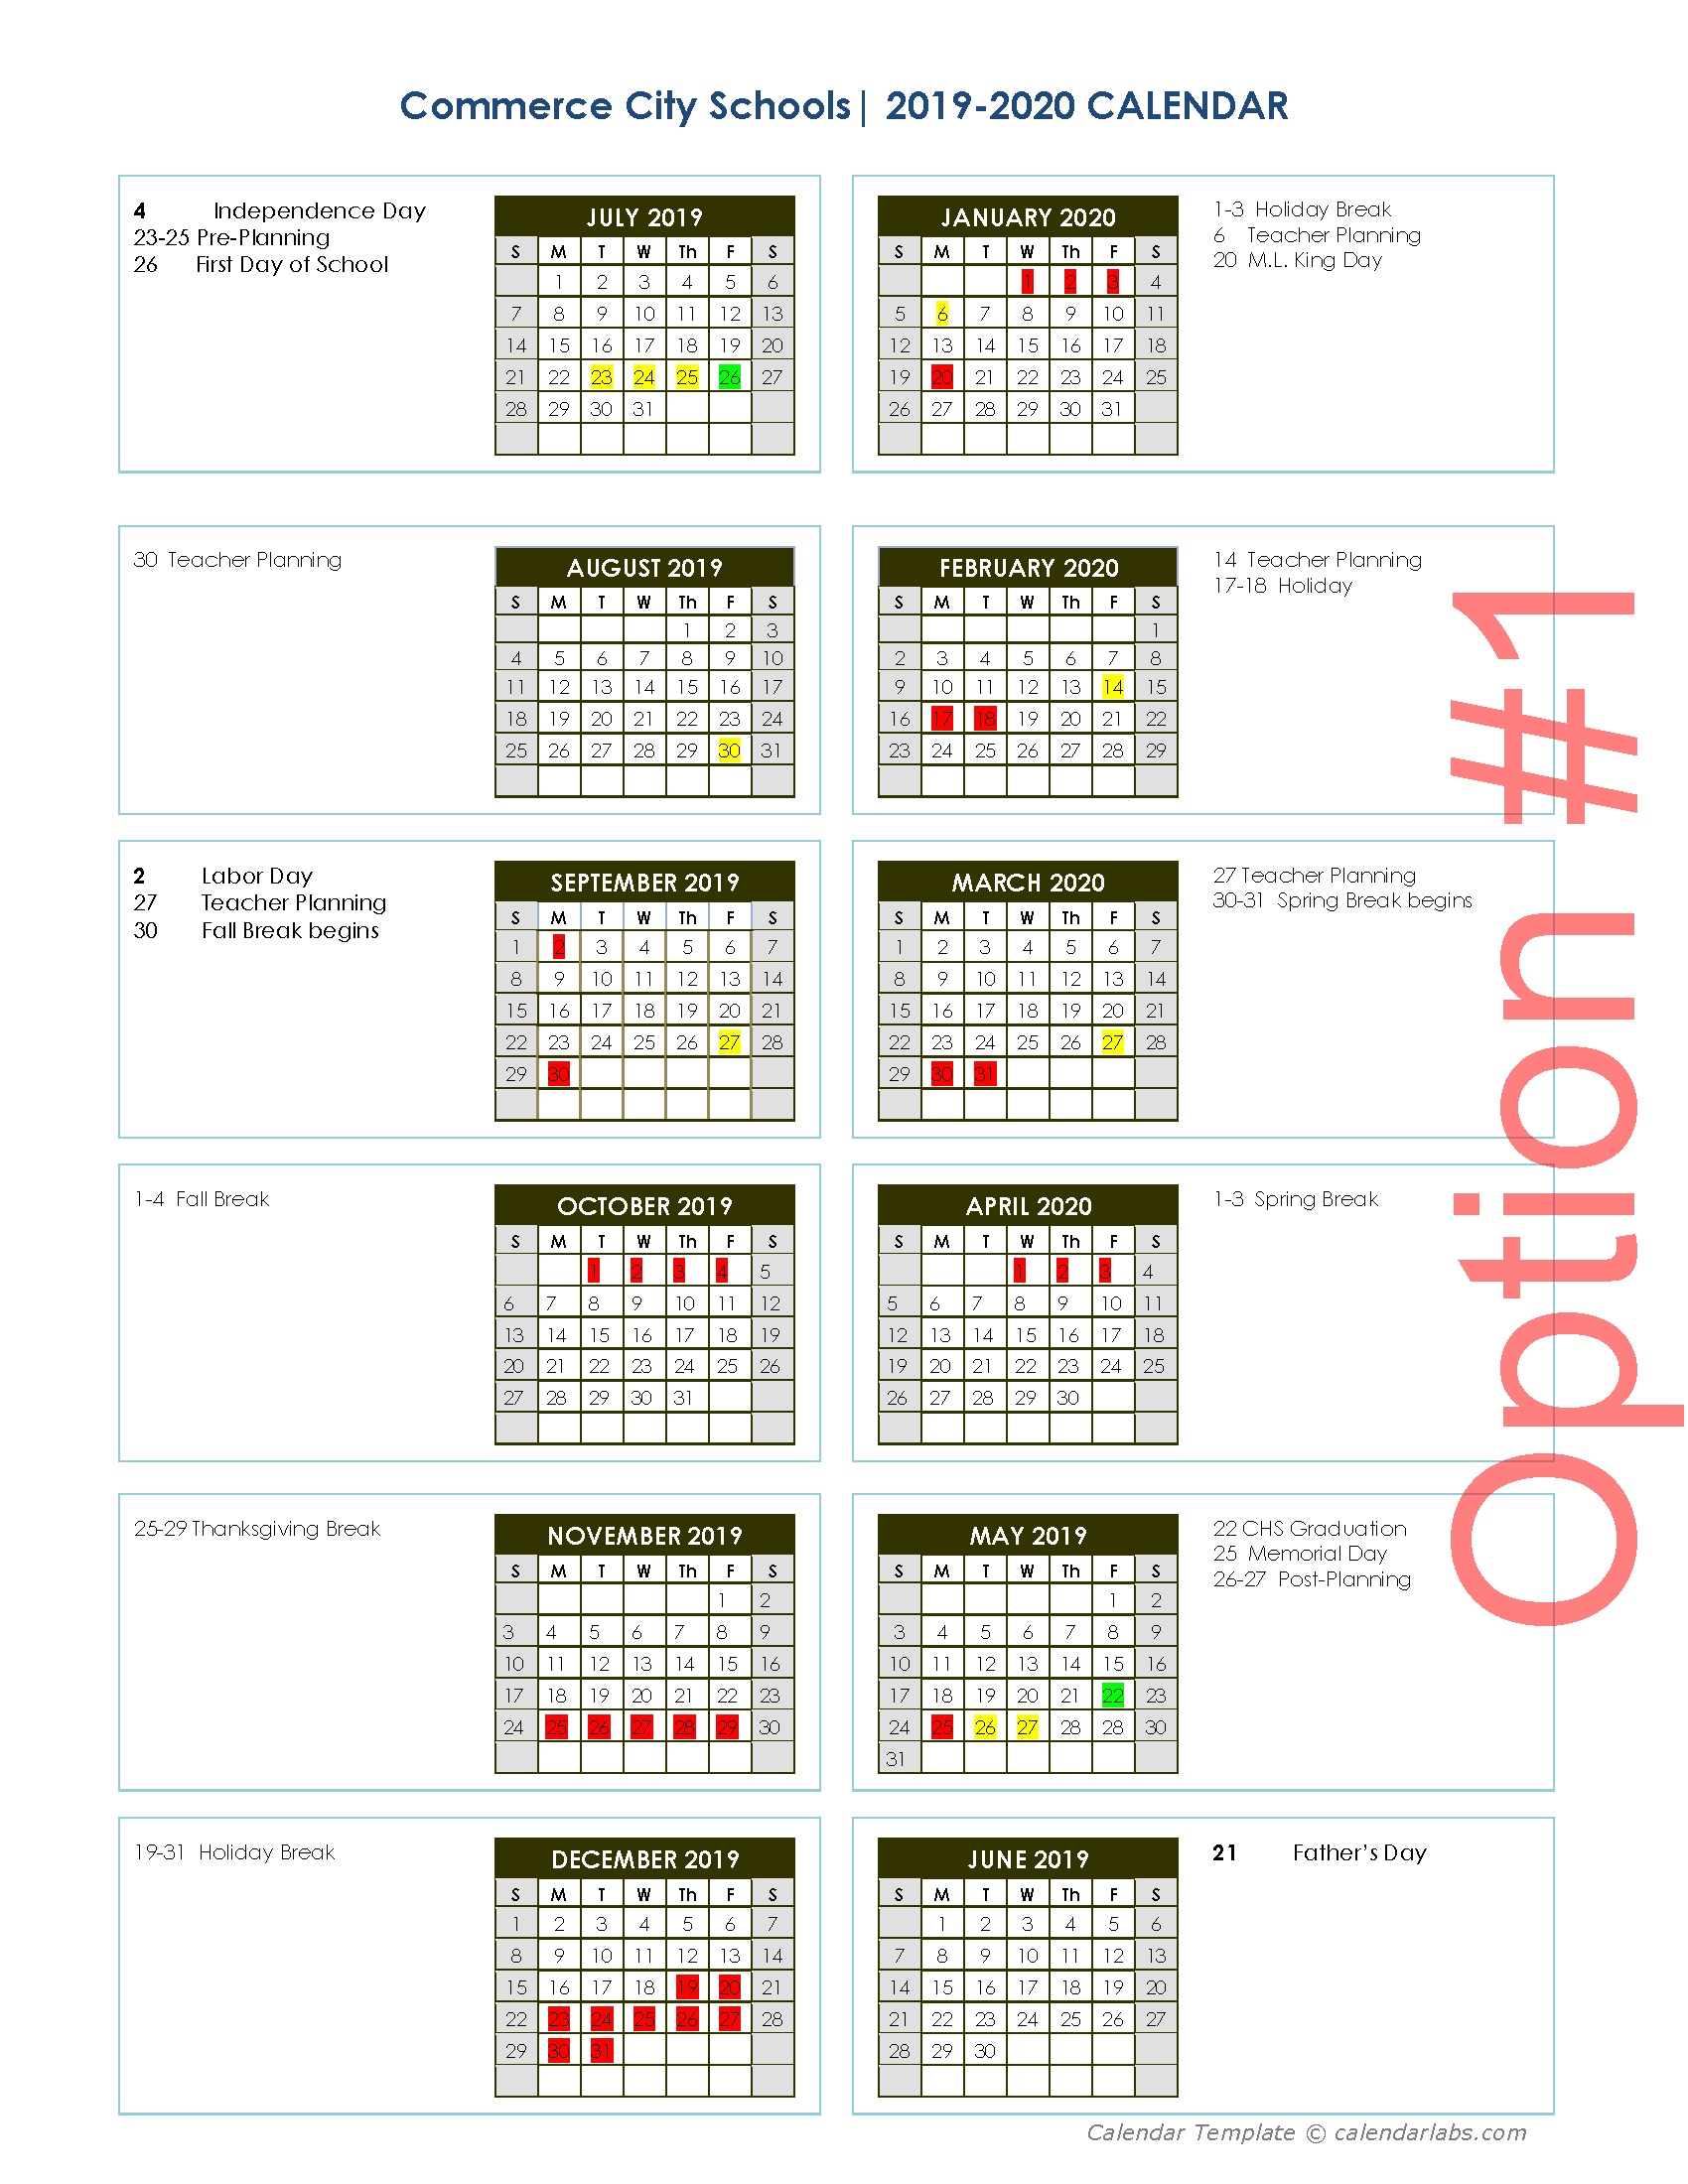 20192020 Calendar Survey  Commerce City Schools inside Gwinnett County School Calendar 2020-20